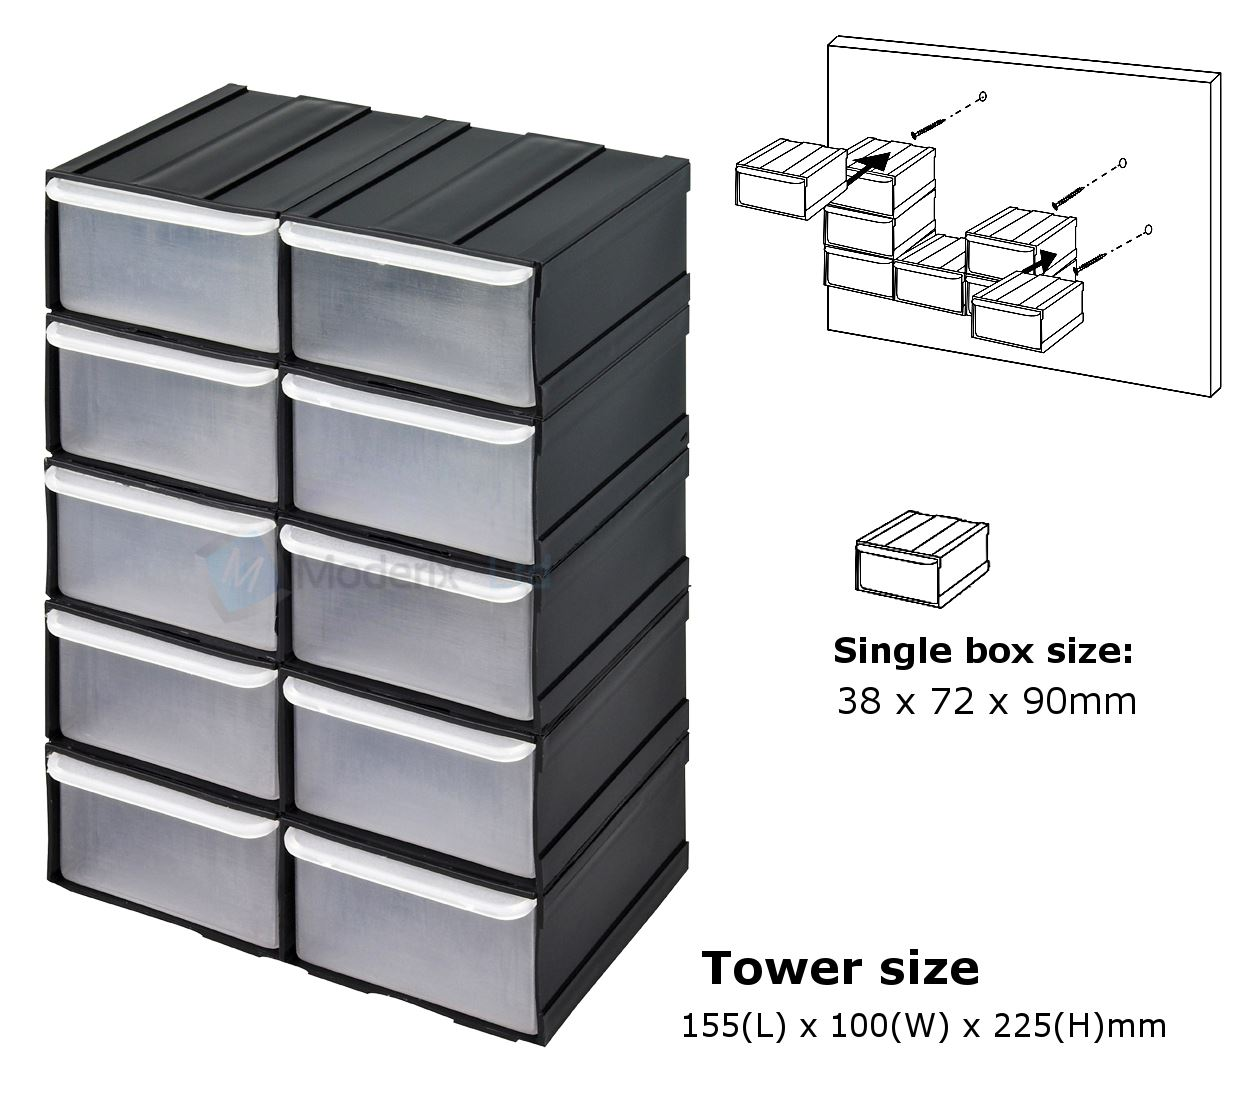 Part Storage For Garages : Pcs plastic parts storage bins boxes tool tidy kit